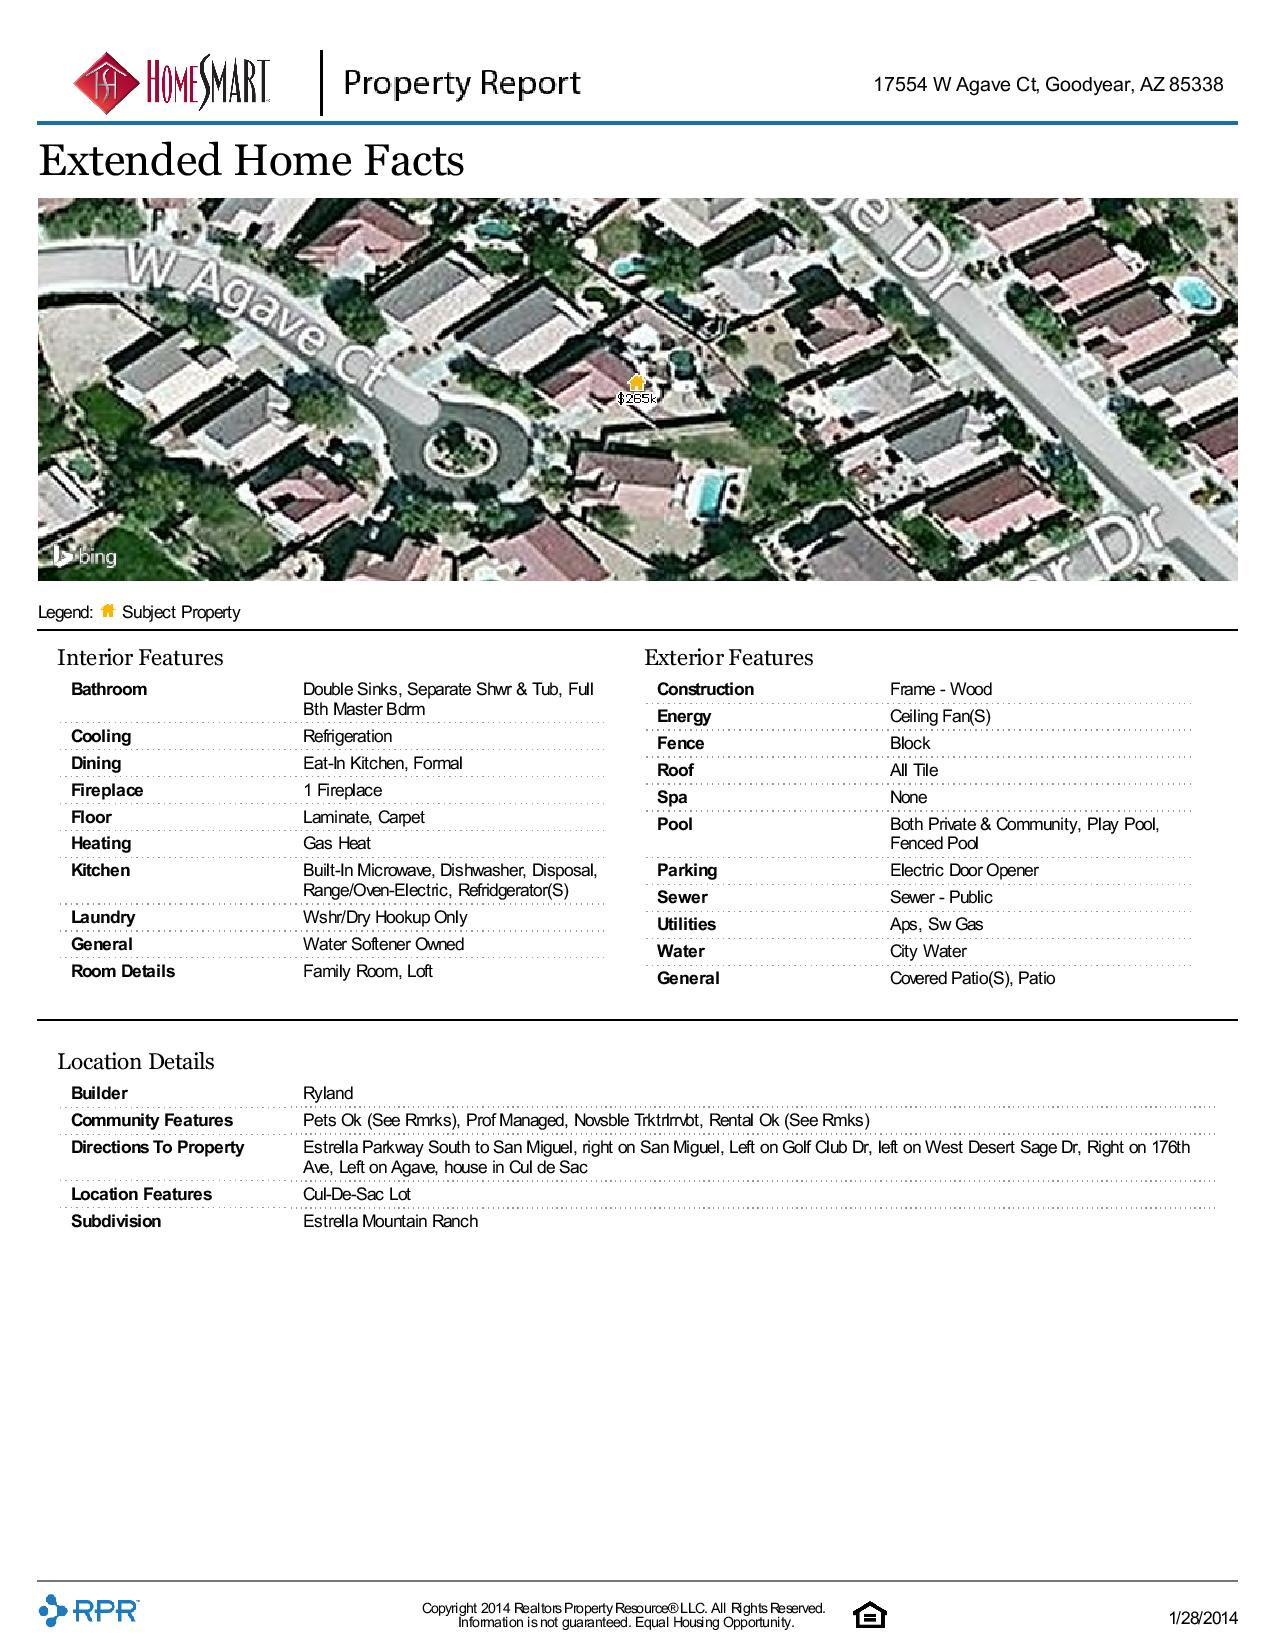 17554-W-Agave-Ct-Goodyear-AZ-85338.pdf-page-004